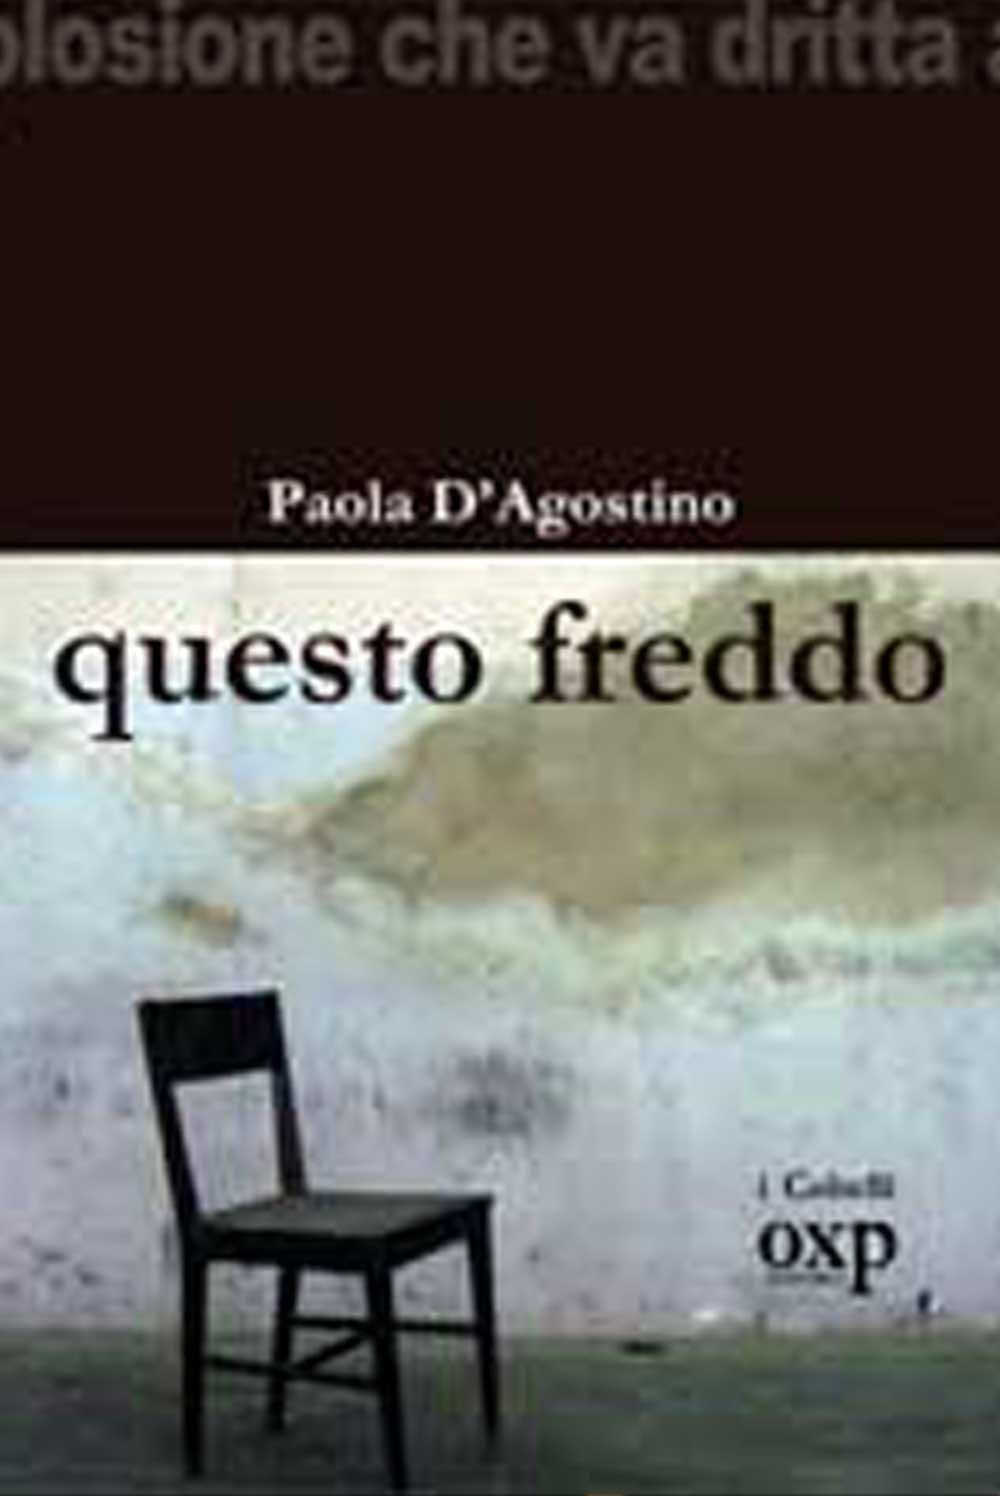 https://www.amazon.it/Questo-freddo-Paola-DAgostino/dp/8895007352